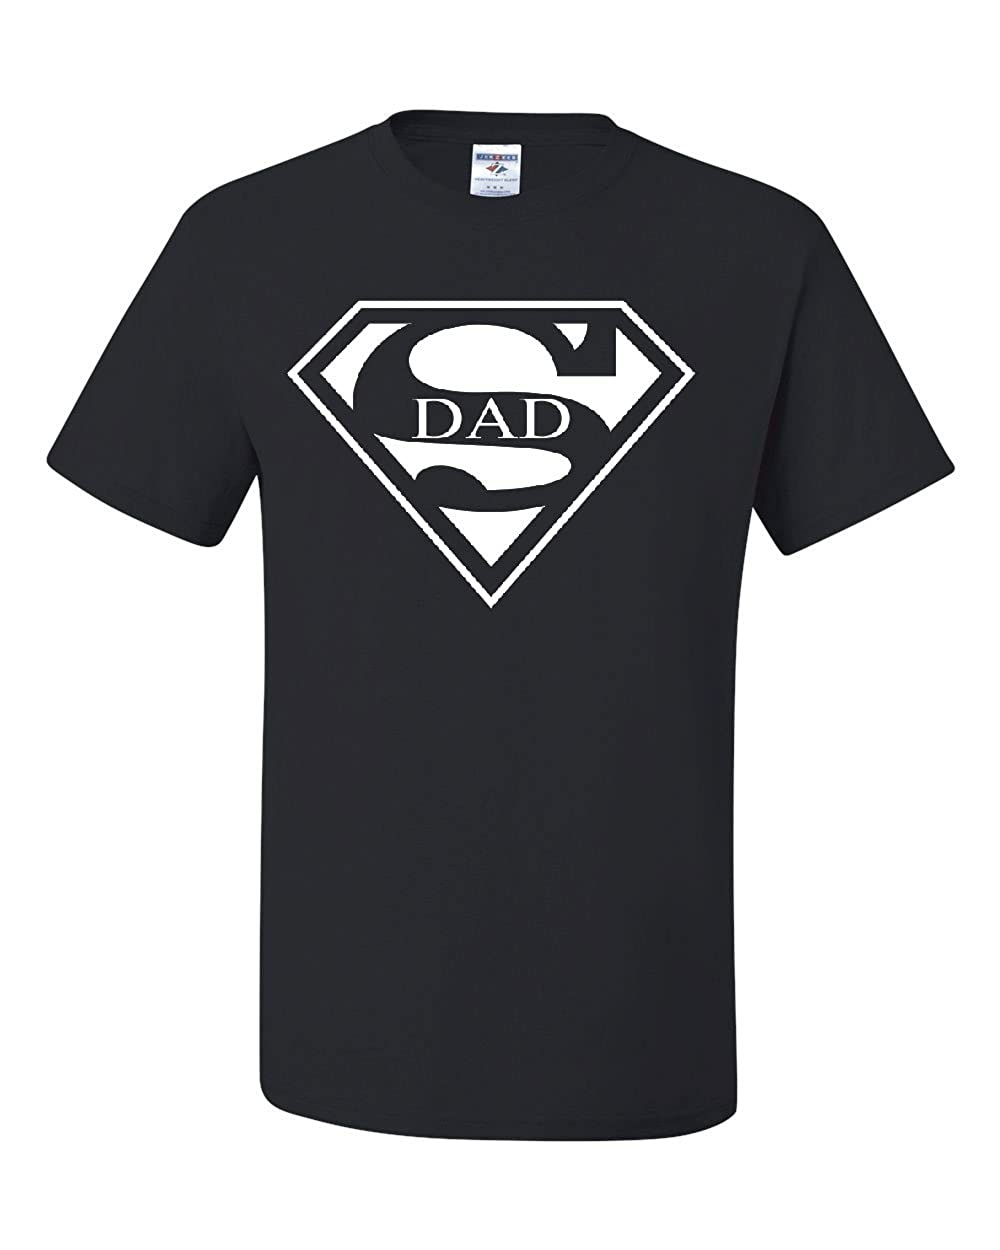 054d1828 Amazon.com: Super Dad T-Shirt Funny Superhero Father's Day Tee Shirt:  Clothing